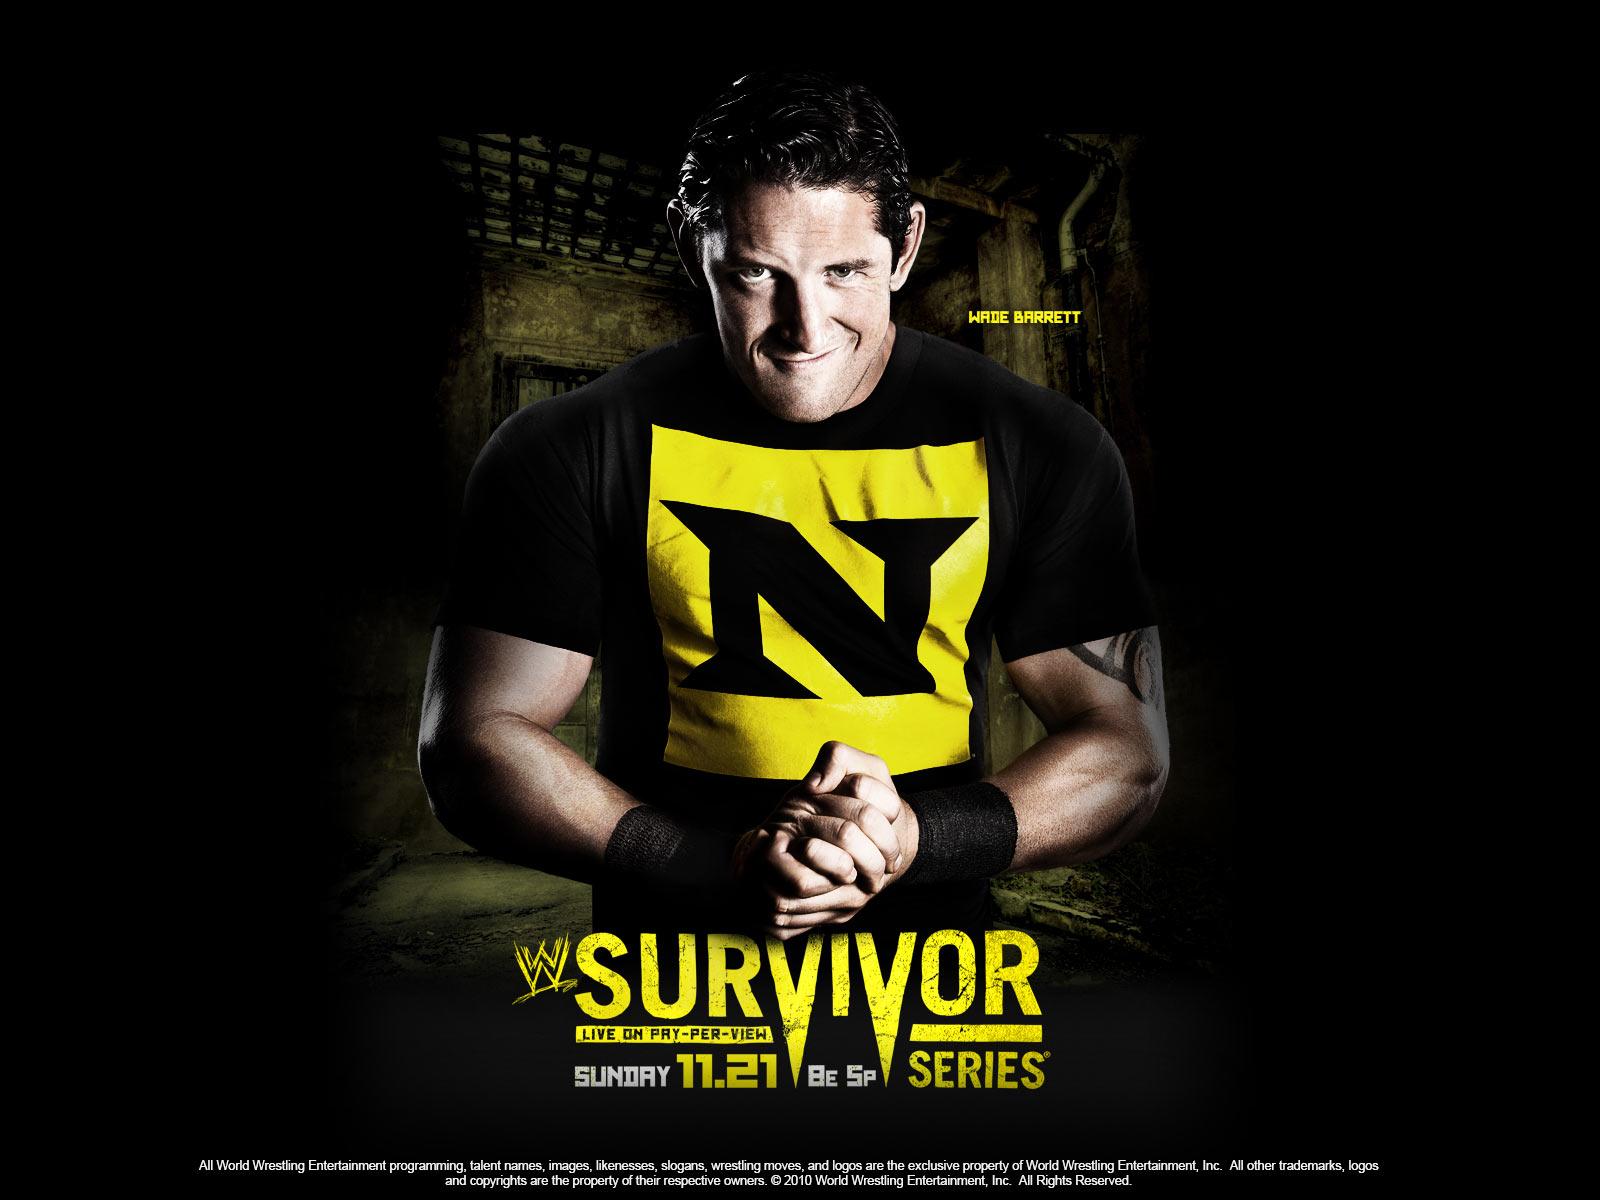 WWE Survivor Series 2010 Predictions Bleacher Report Latest 1600x1200